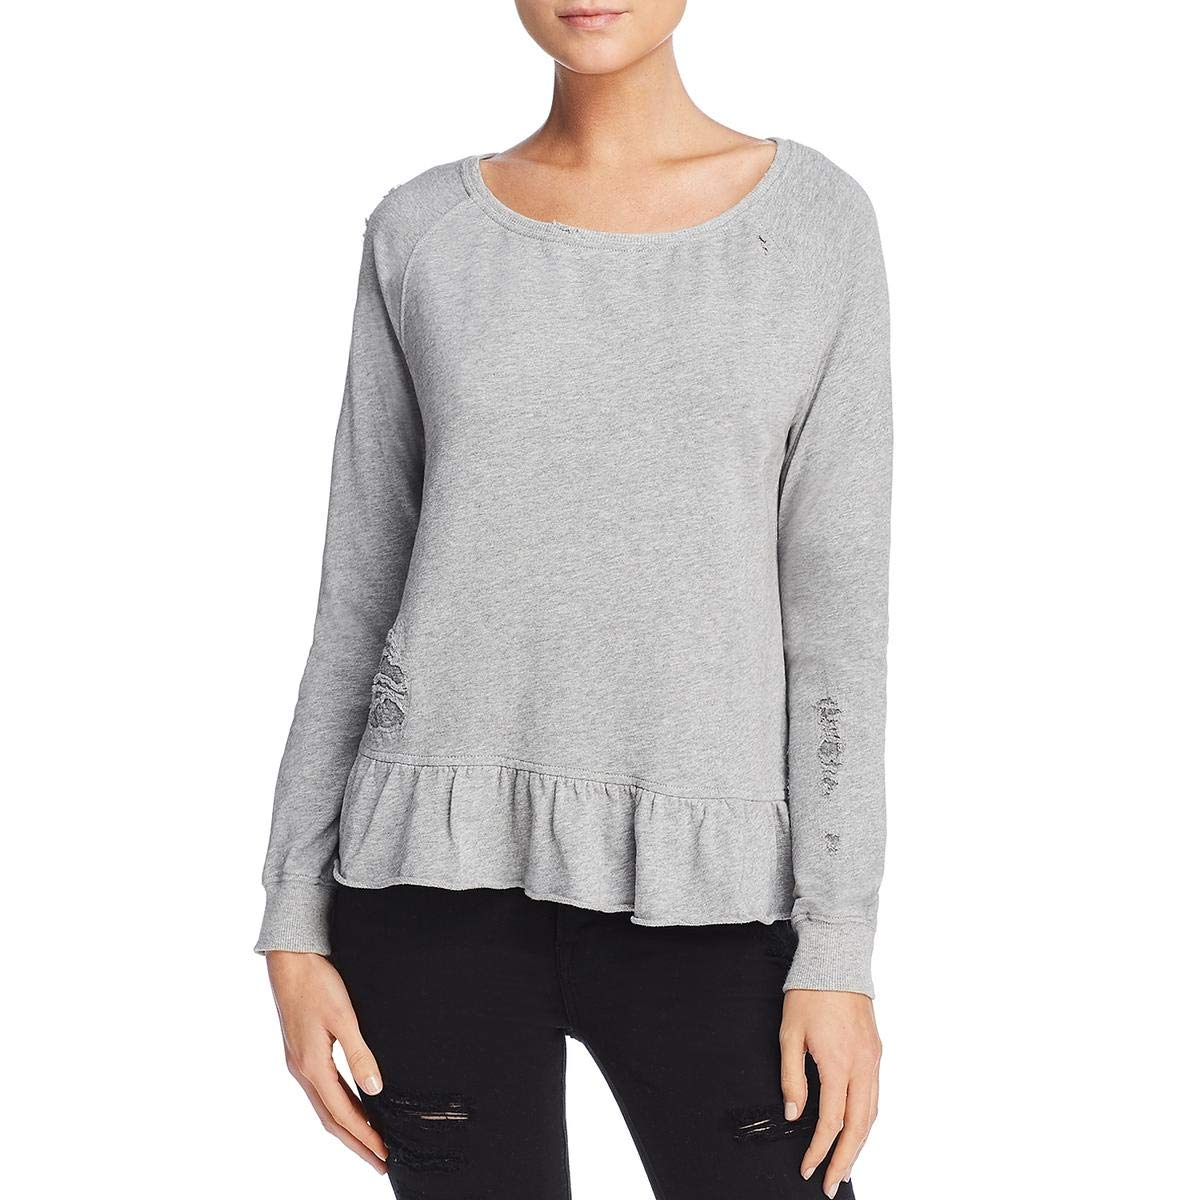 Pam /& Gela Ruffle Sweatshirt